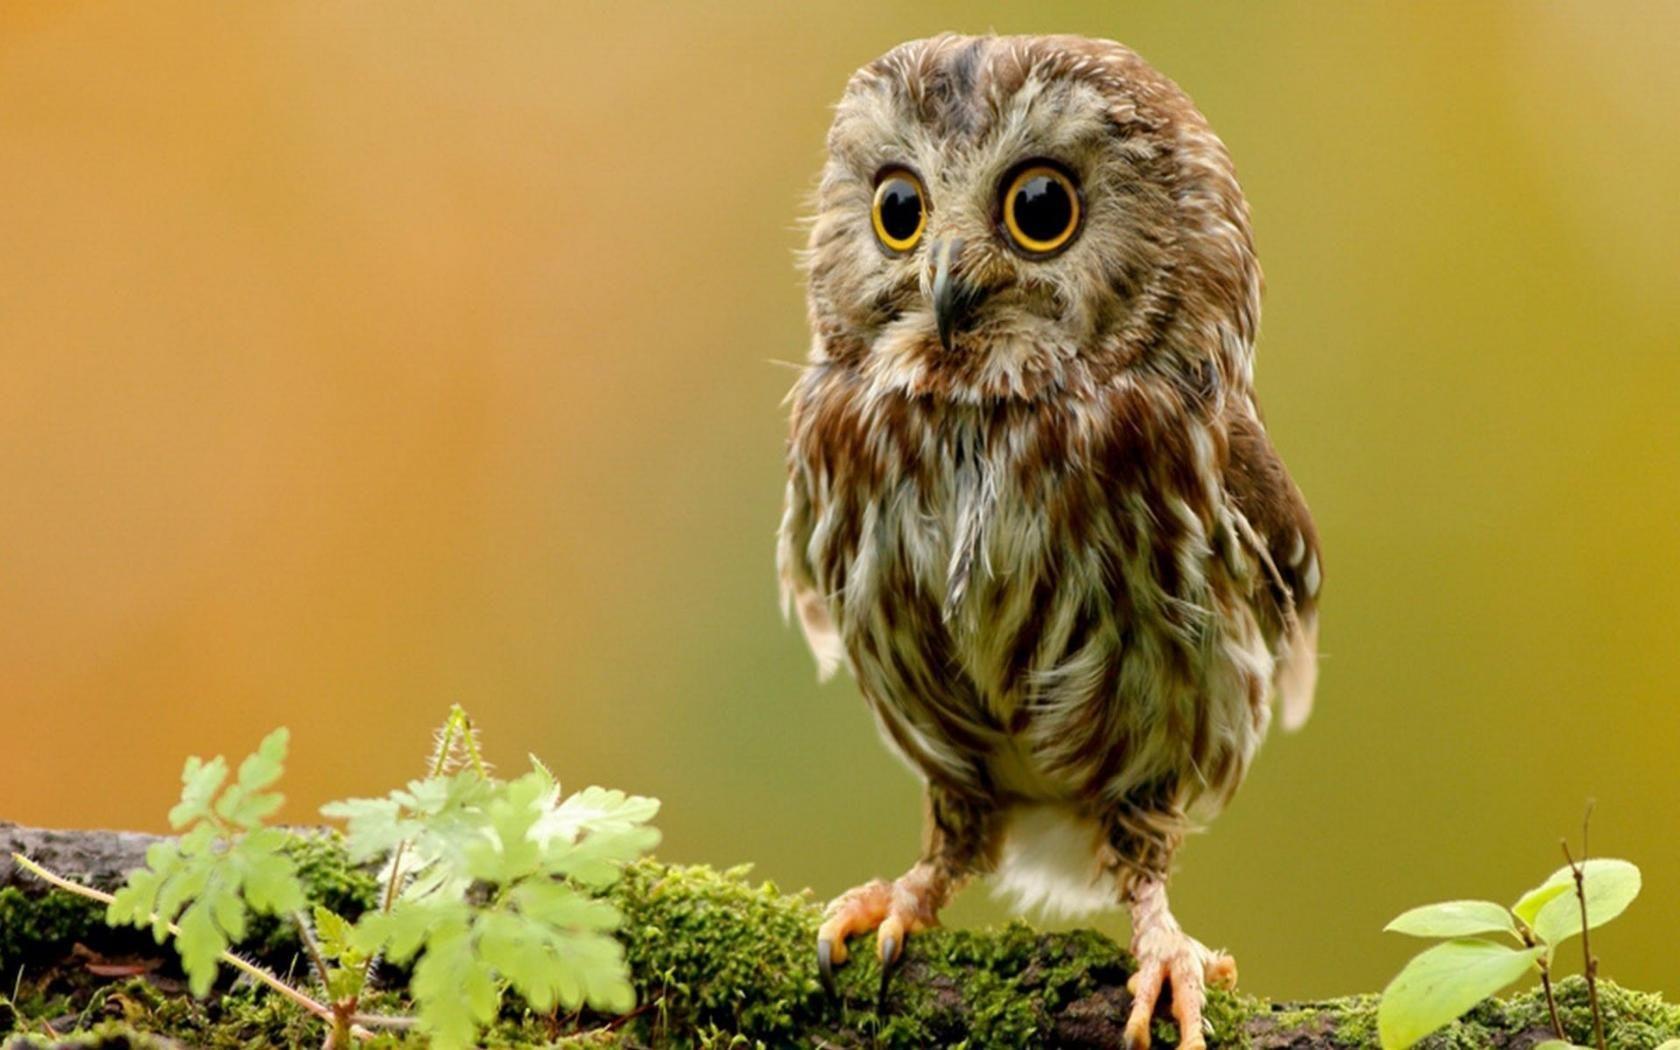 Owlet Animal HD Desktop Wallpaper Bird Owl